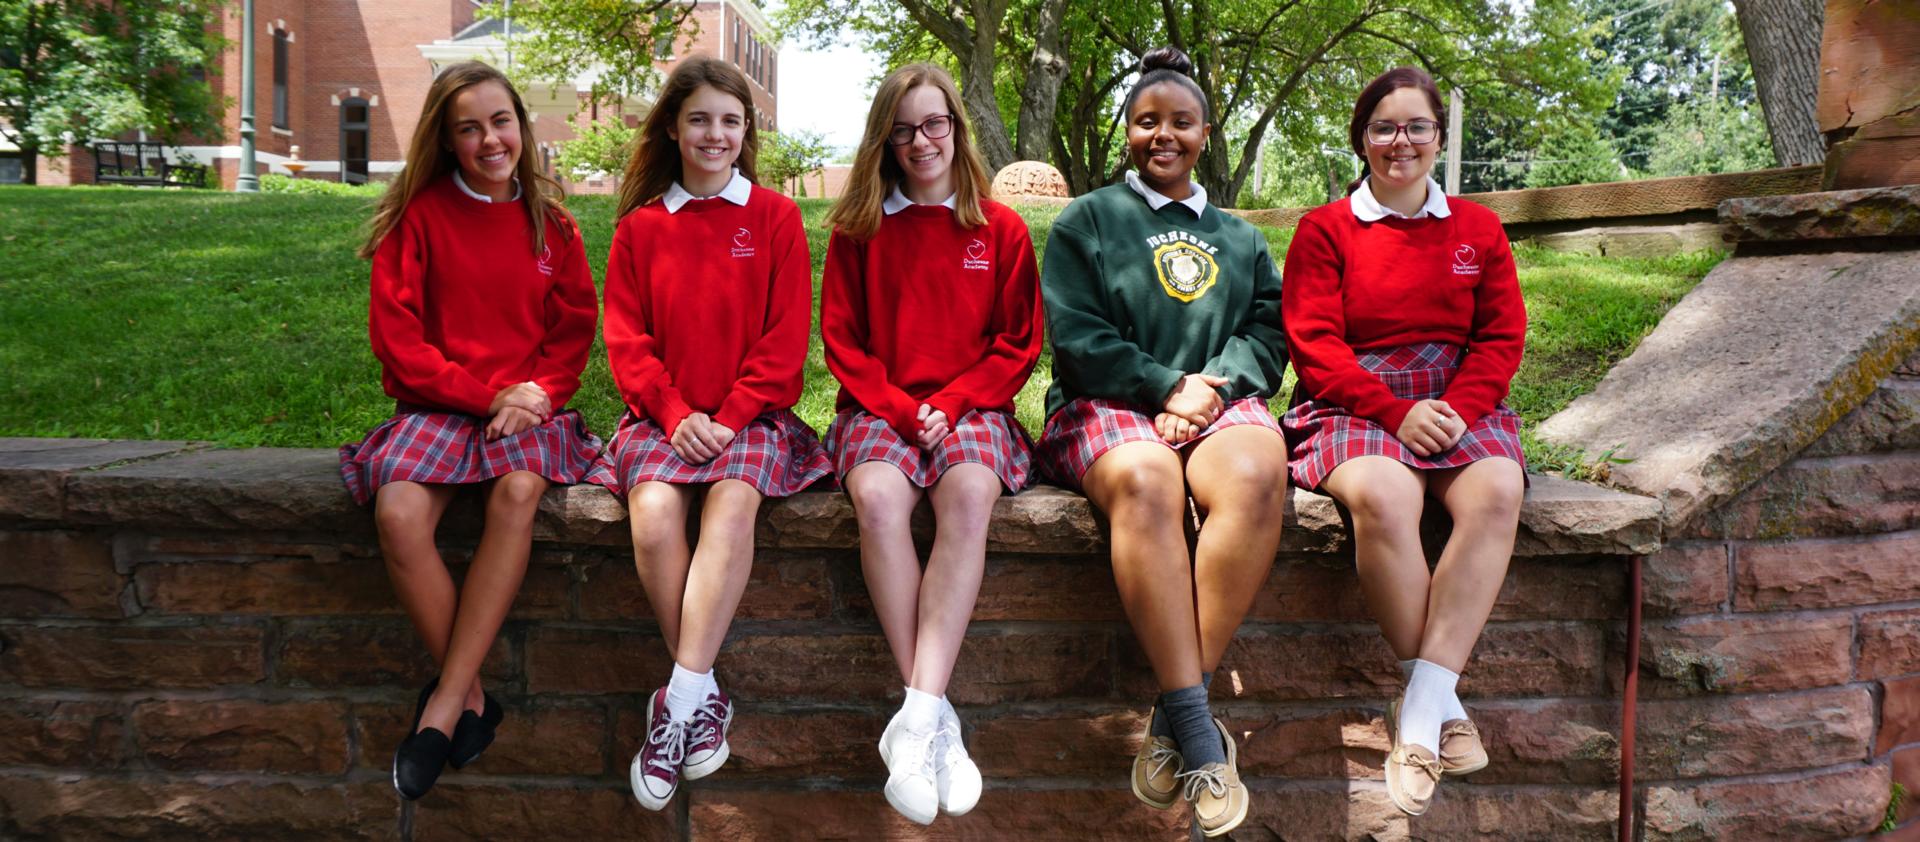 girls posed in uniforms